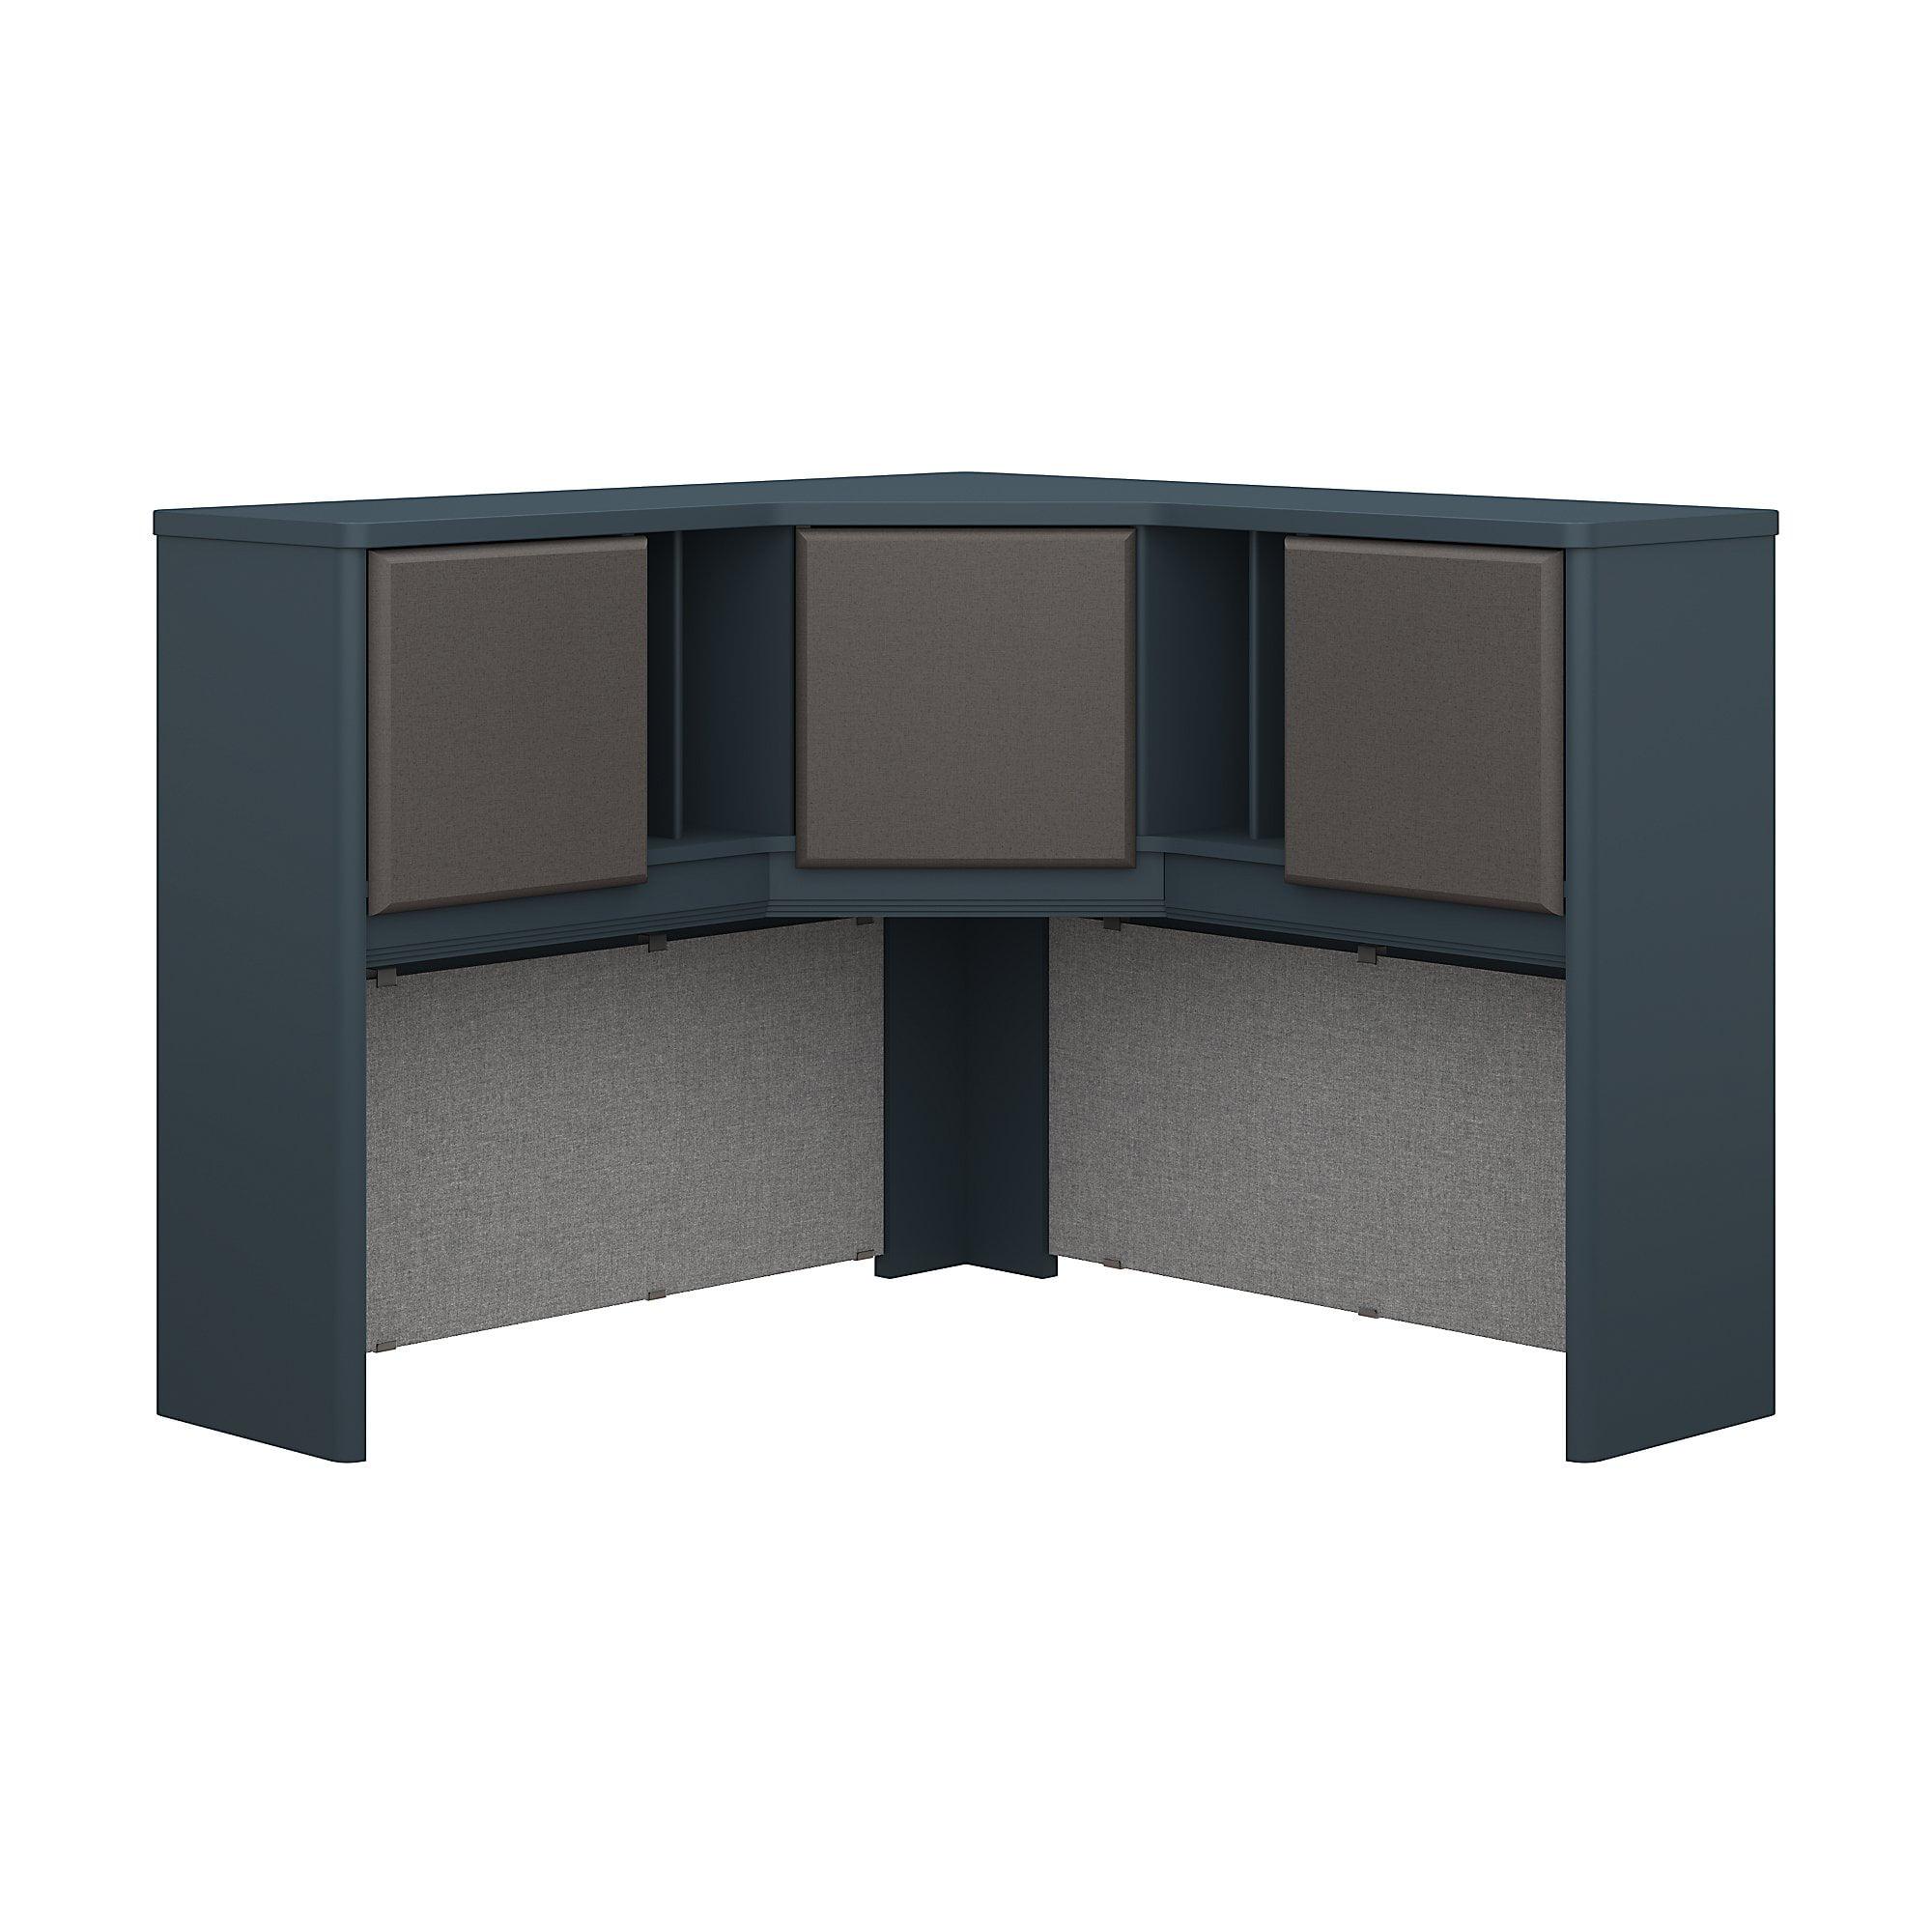 Office furniture series a versatile c leg table design engineered wood slate corner hutch walmart com